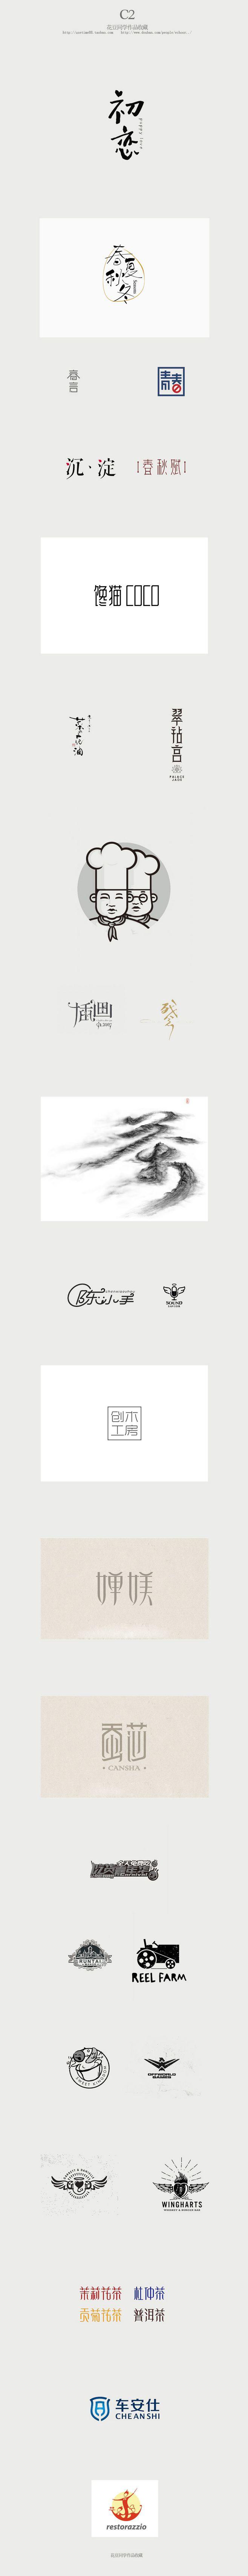 C2—logo:初恋、春夏秋冬、青春、沉...